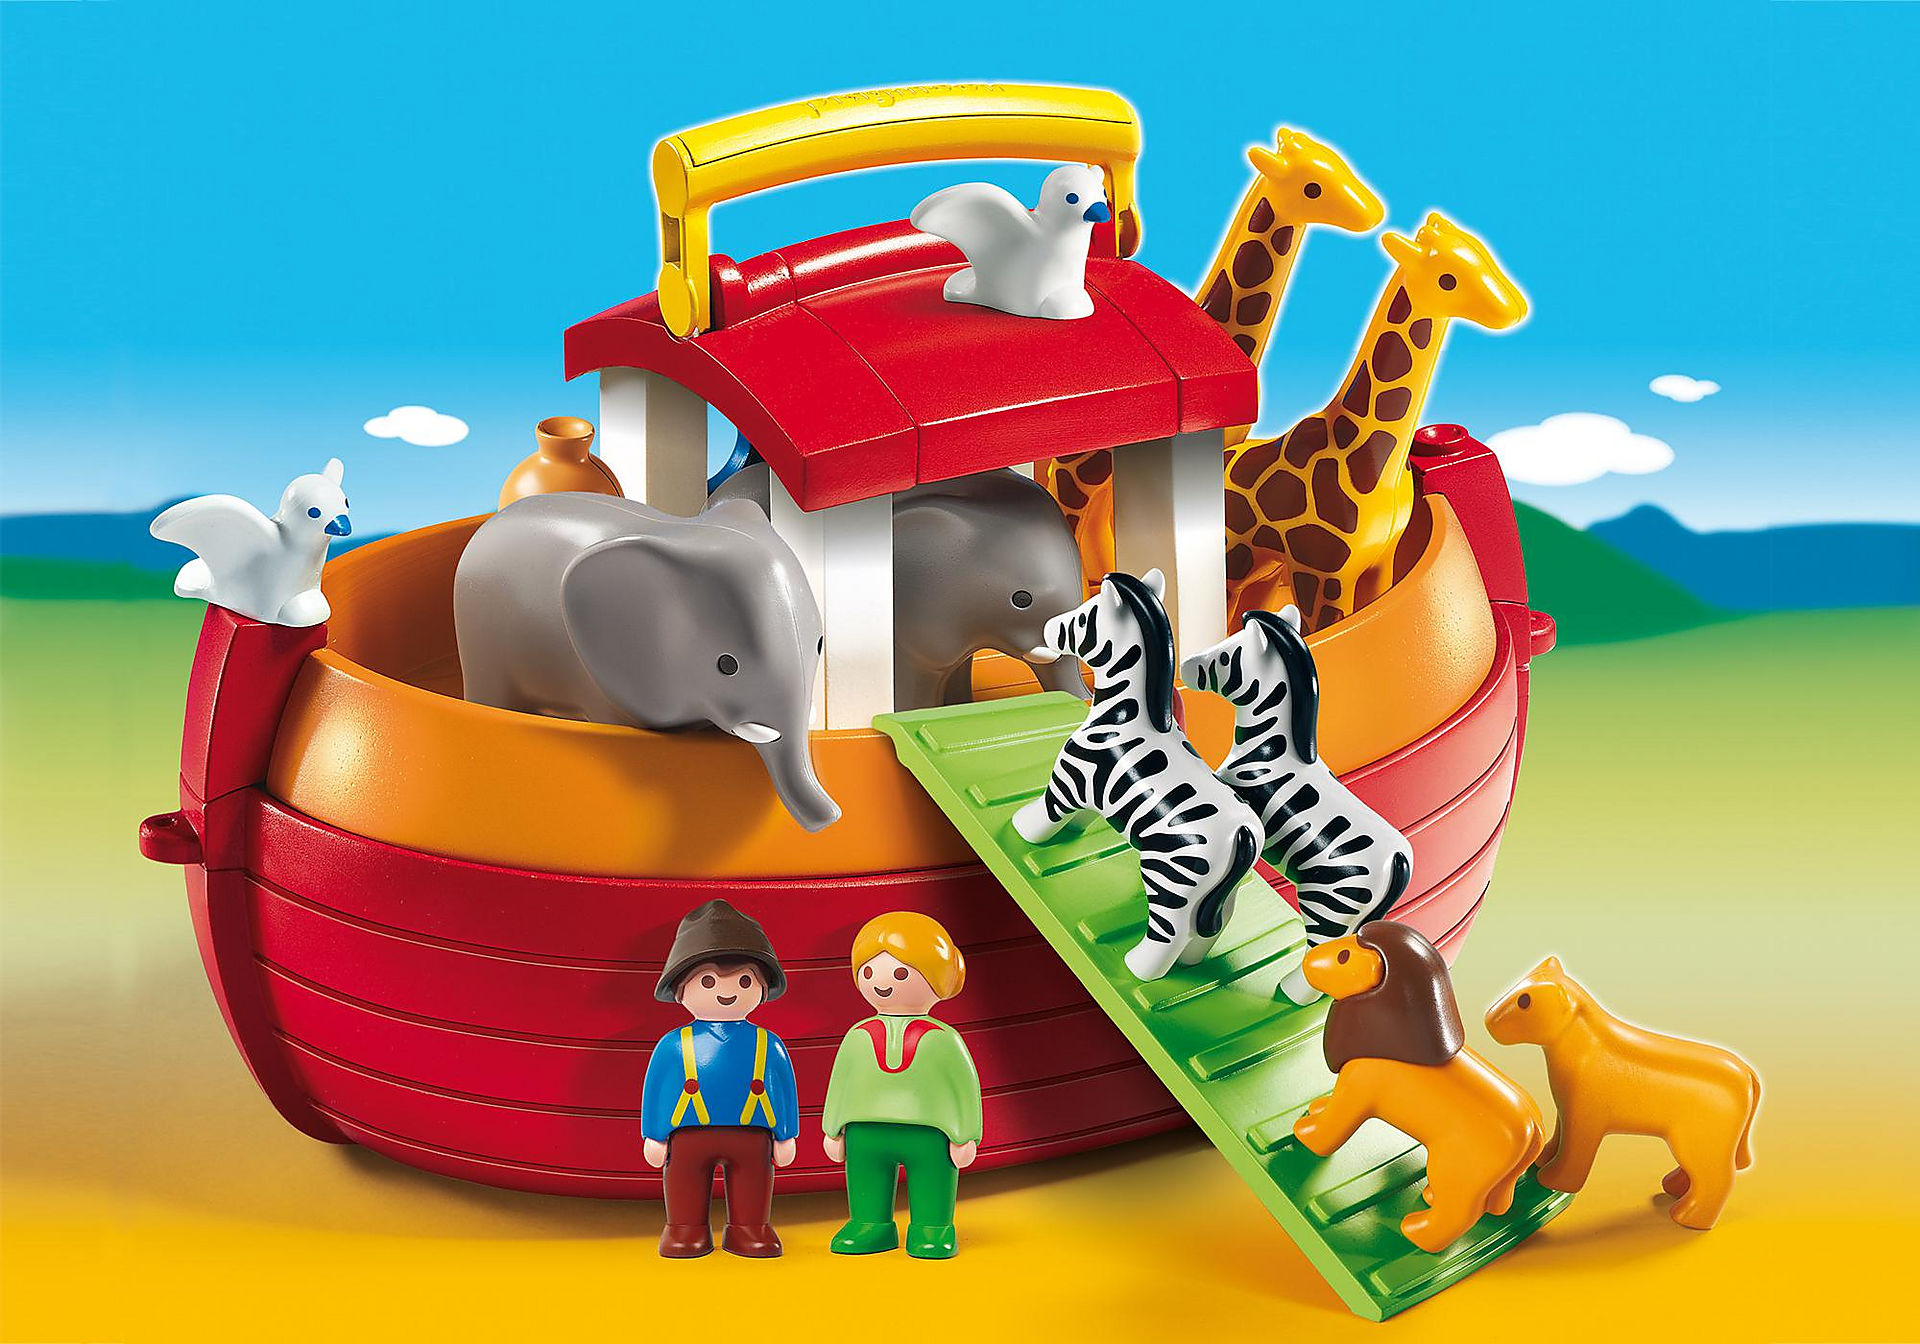 http://media.playmobil.com/i/playmobil/6765_product_detail/Meine Mitnehm-Arche Noah